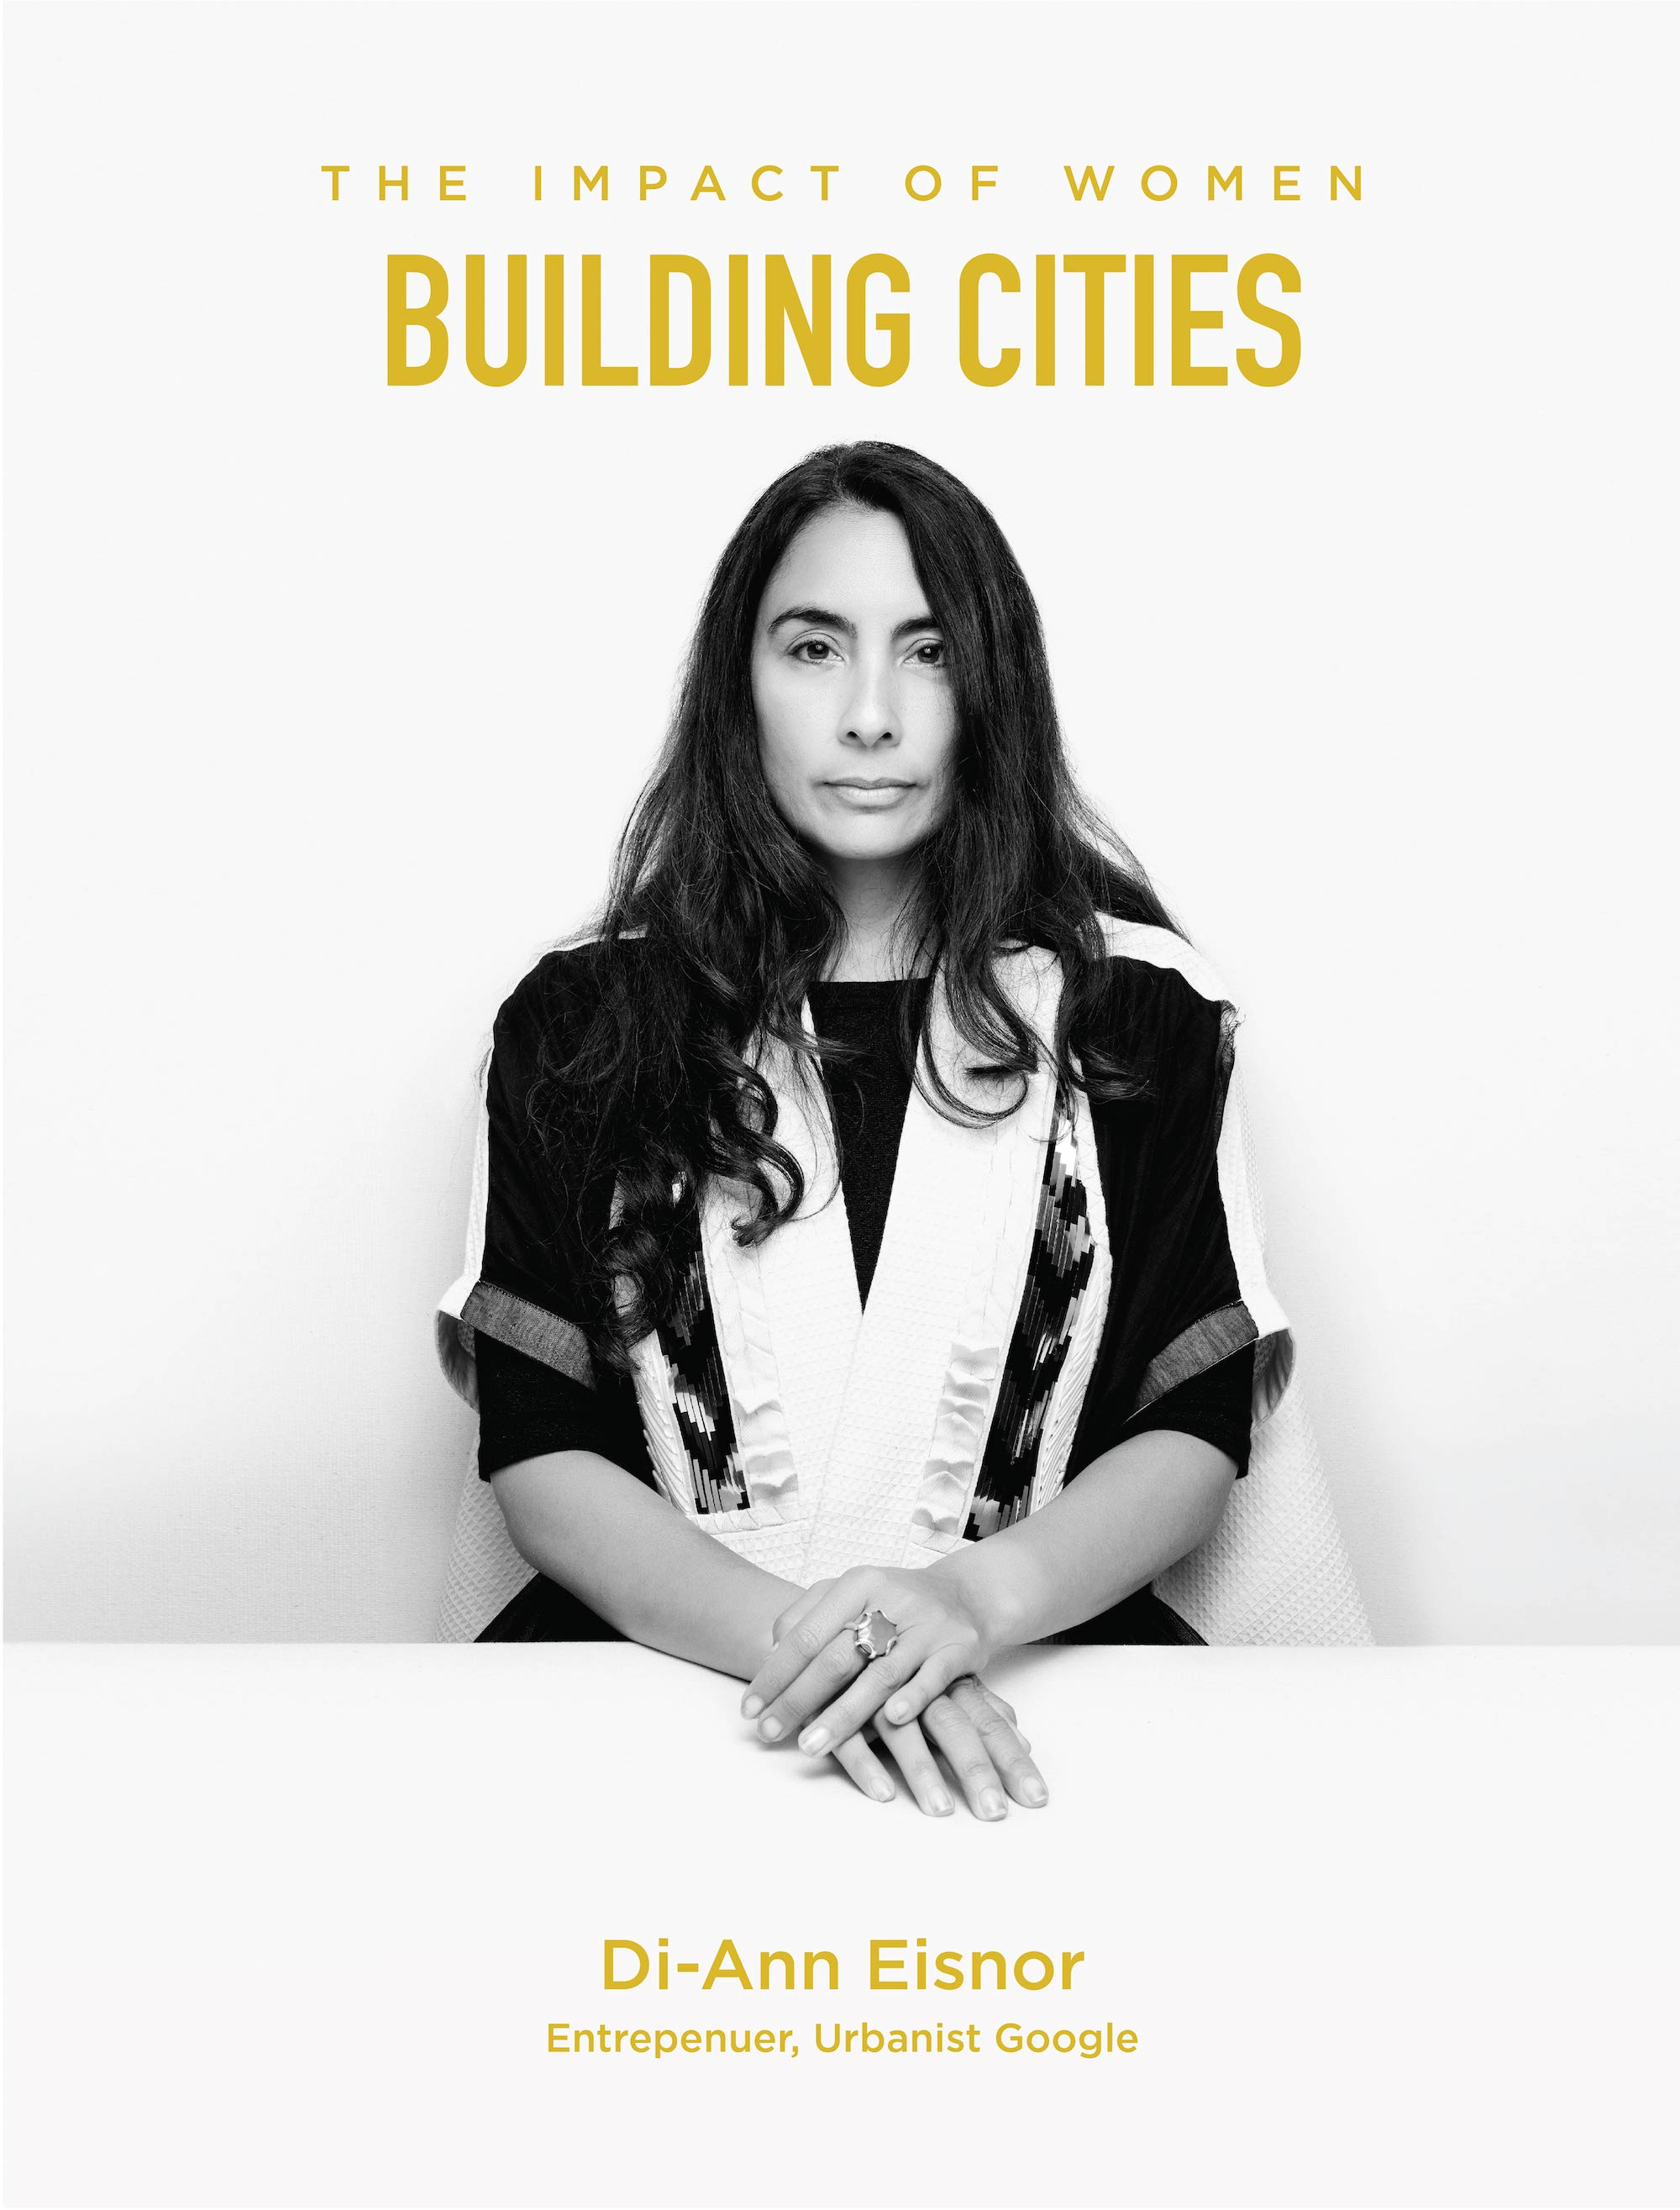 Di-Ann Eisnor is Building Cities